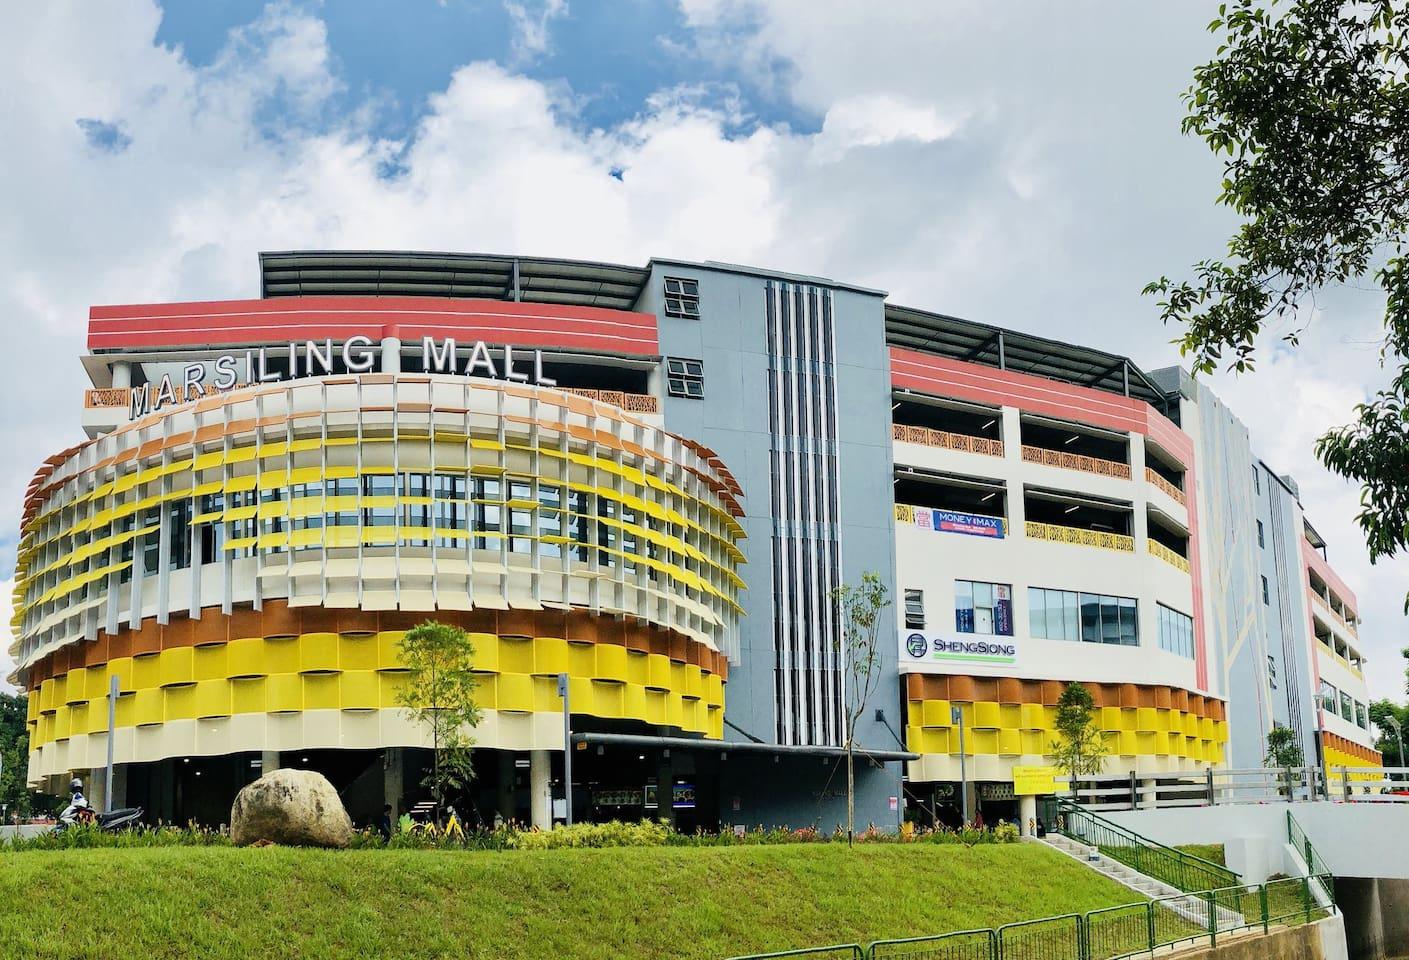 Marsiling Mall